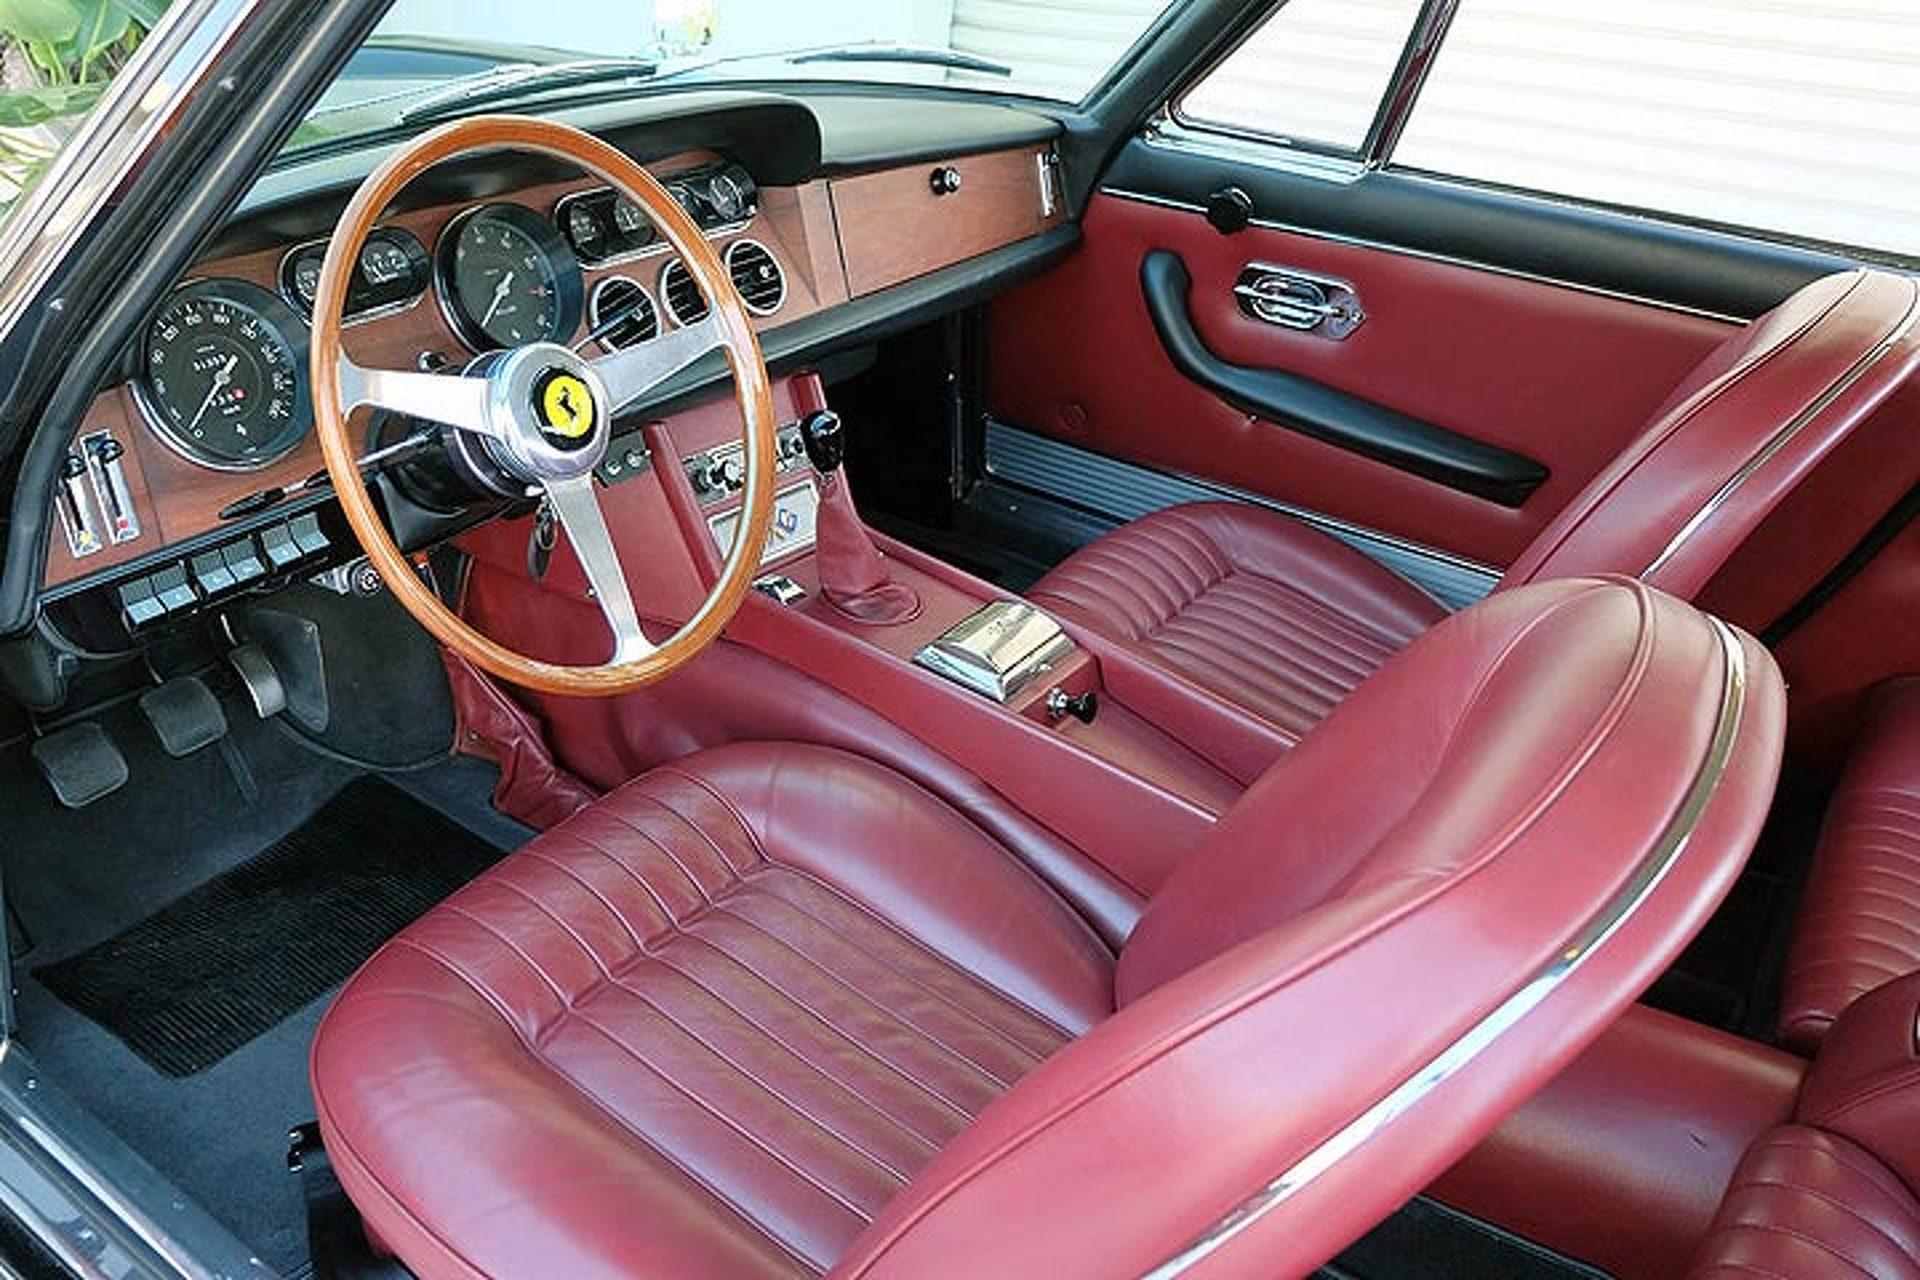 Adam Carolla's Beautiful 1966 Ferrari Heads to Auction